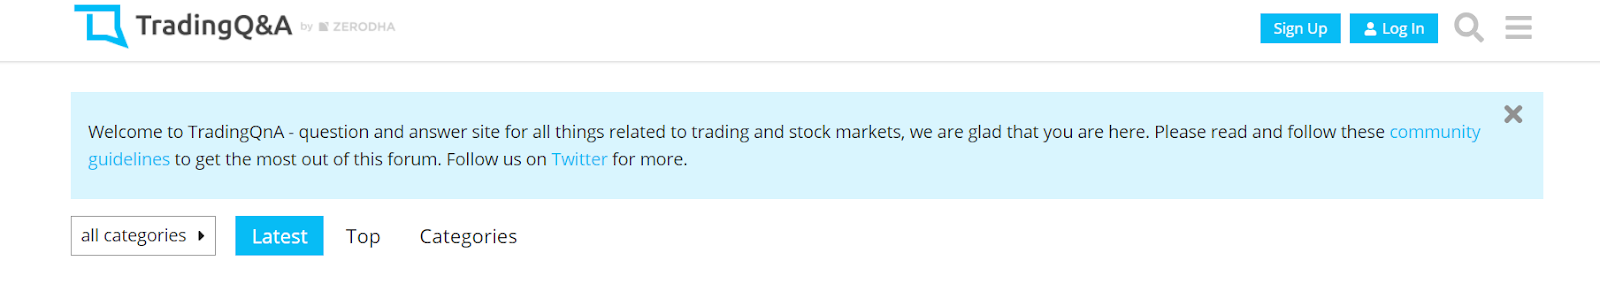 Trading Q&A